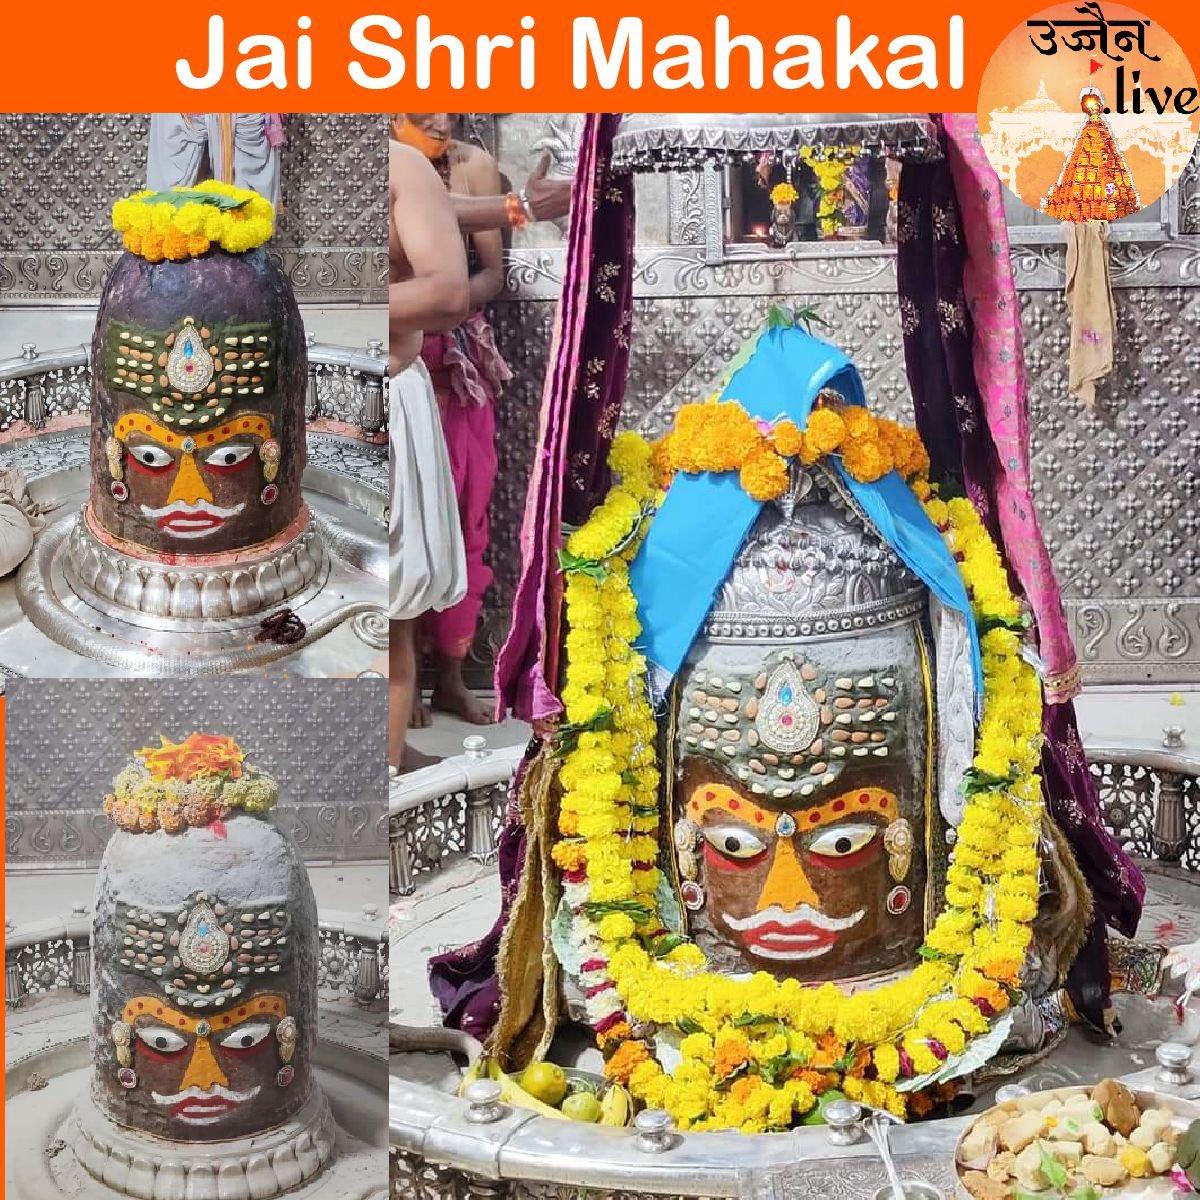 Oct 25:  Bhasma Aarti darshan of Shree #Mahakaleshwar #Ujjain #shiv #shiva #bholenath #mahadev #हर_हर_महादेव #jaibholenath #jaimahakal #om #omnamahshivay #harharmahadev  #mahakal #goodmorning #SundayVibes  #Incredibleindia  @HinduTempleLive @BharatTemples_ https://t.co/1Ak1LnLmNR